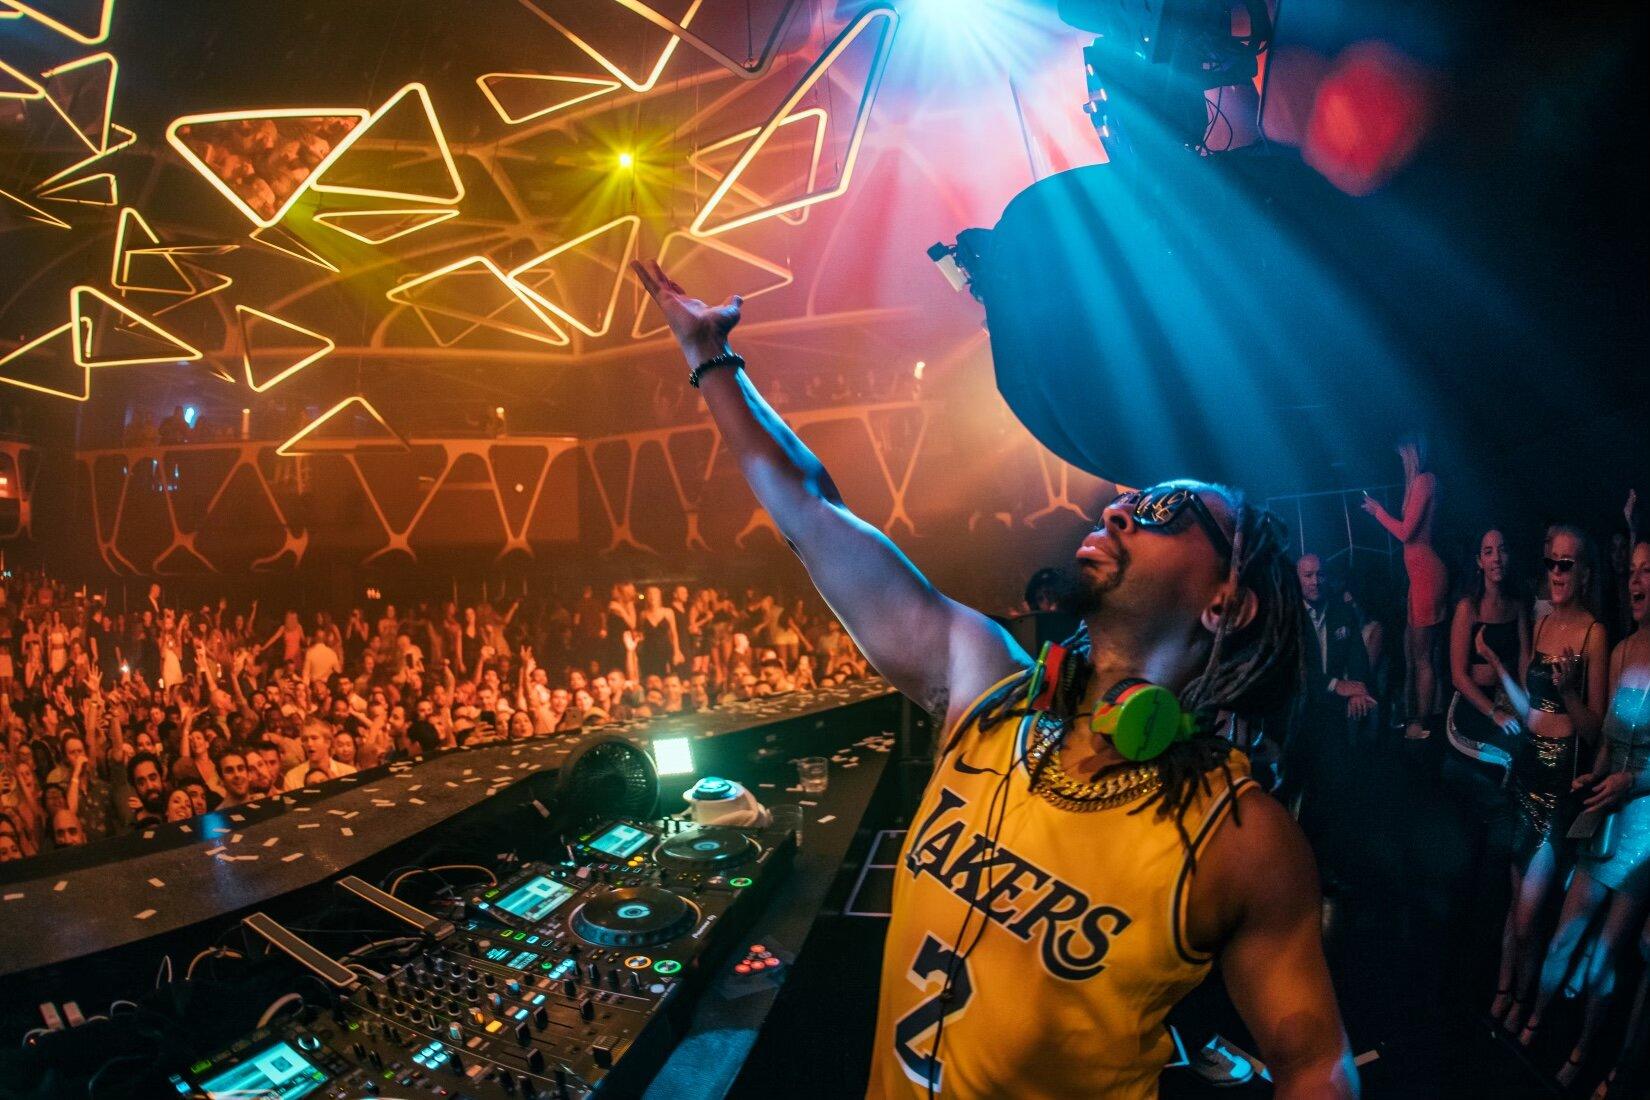 Lil Jon courtesy of Beatsource